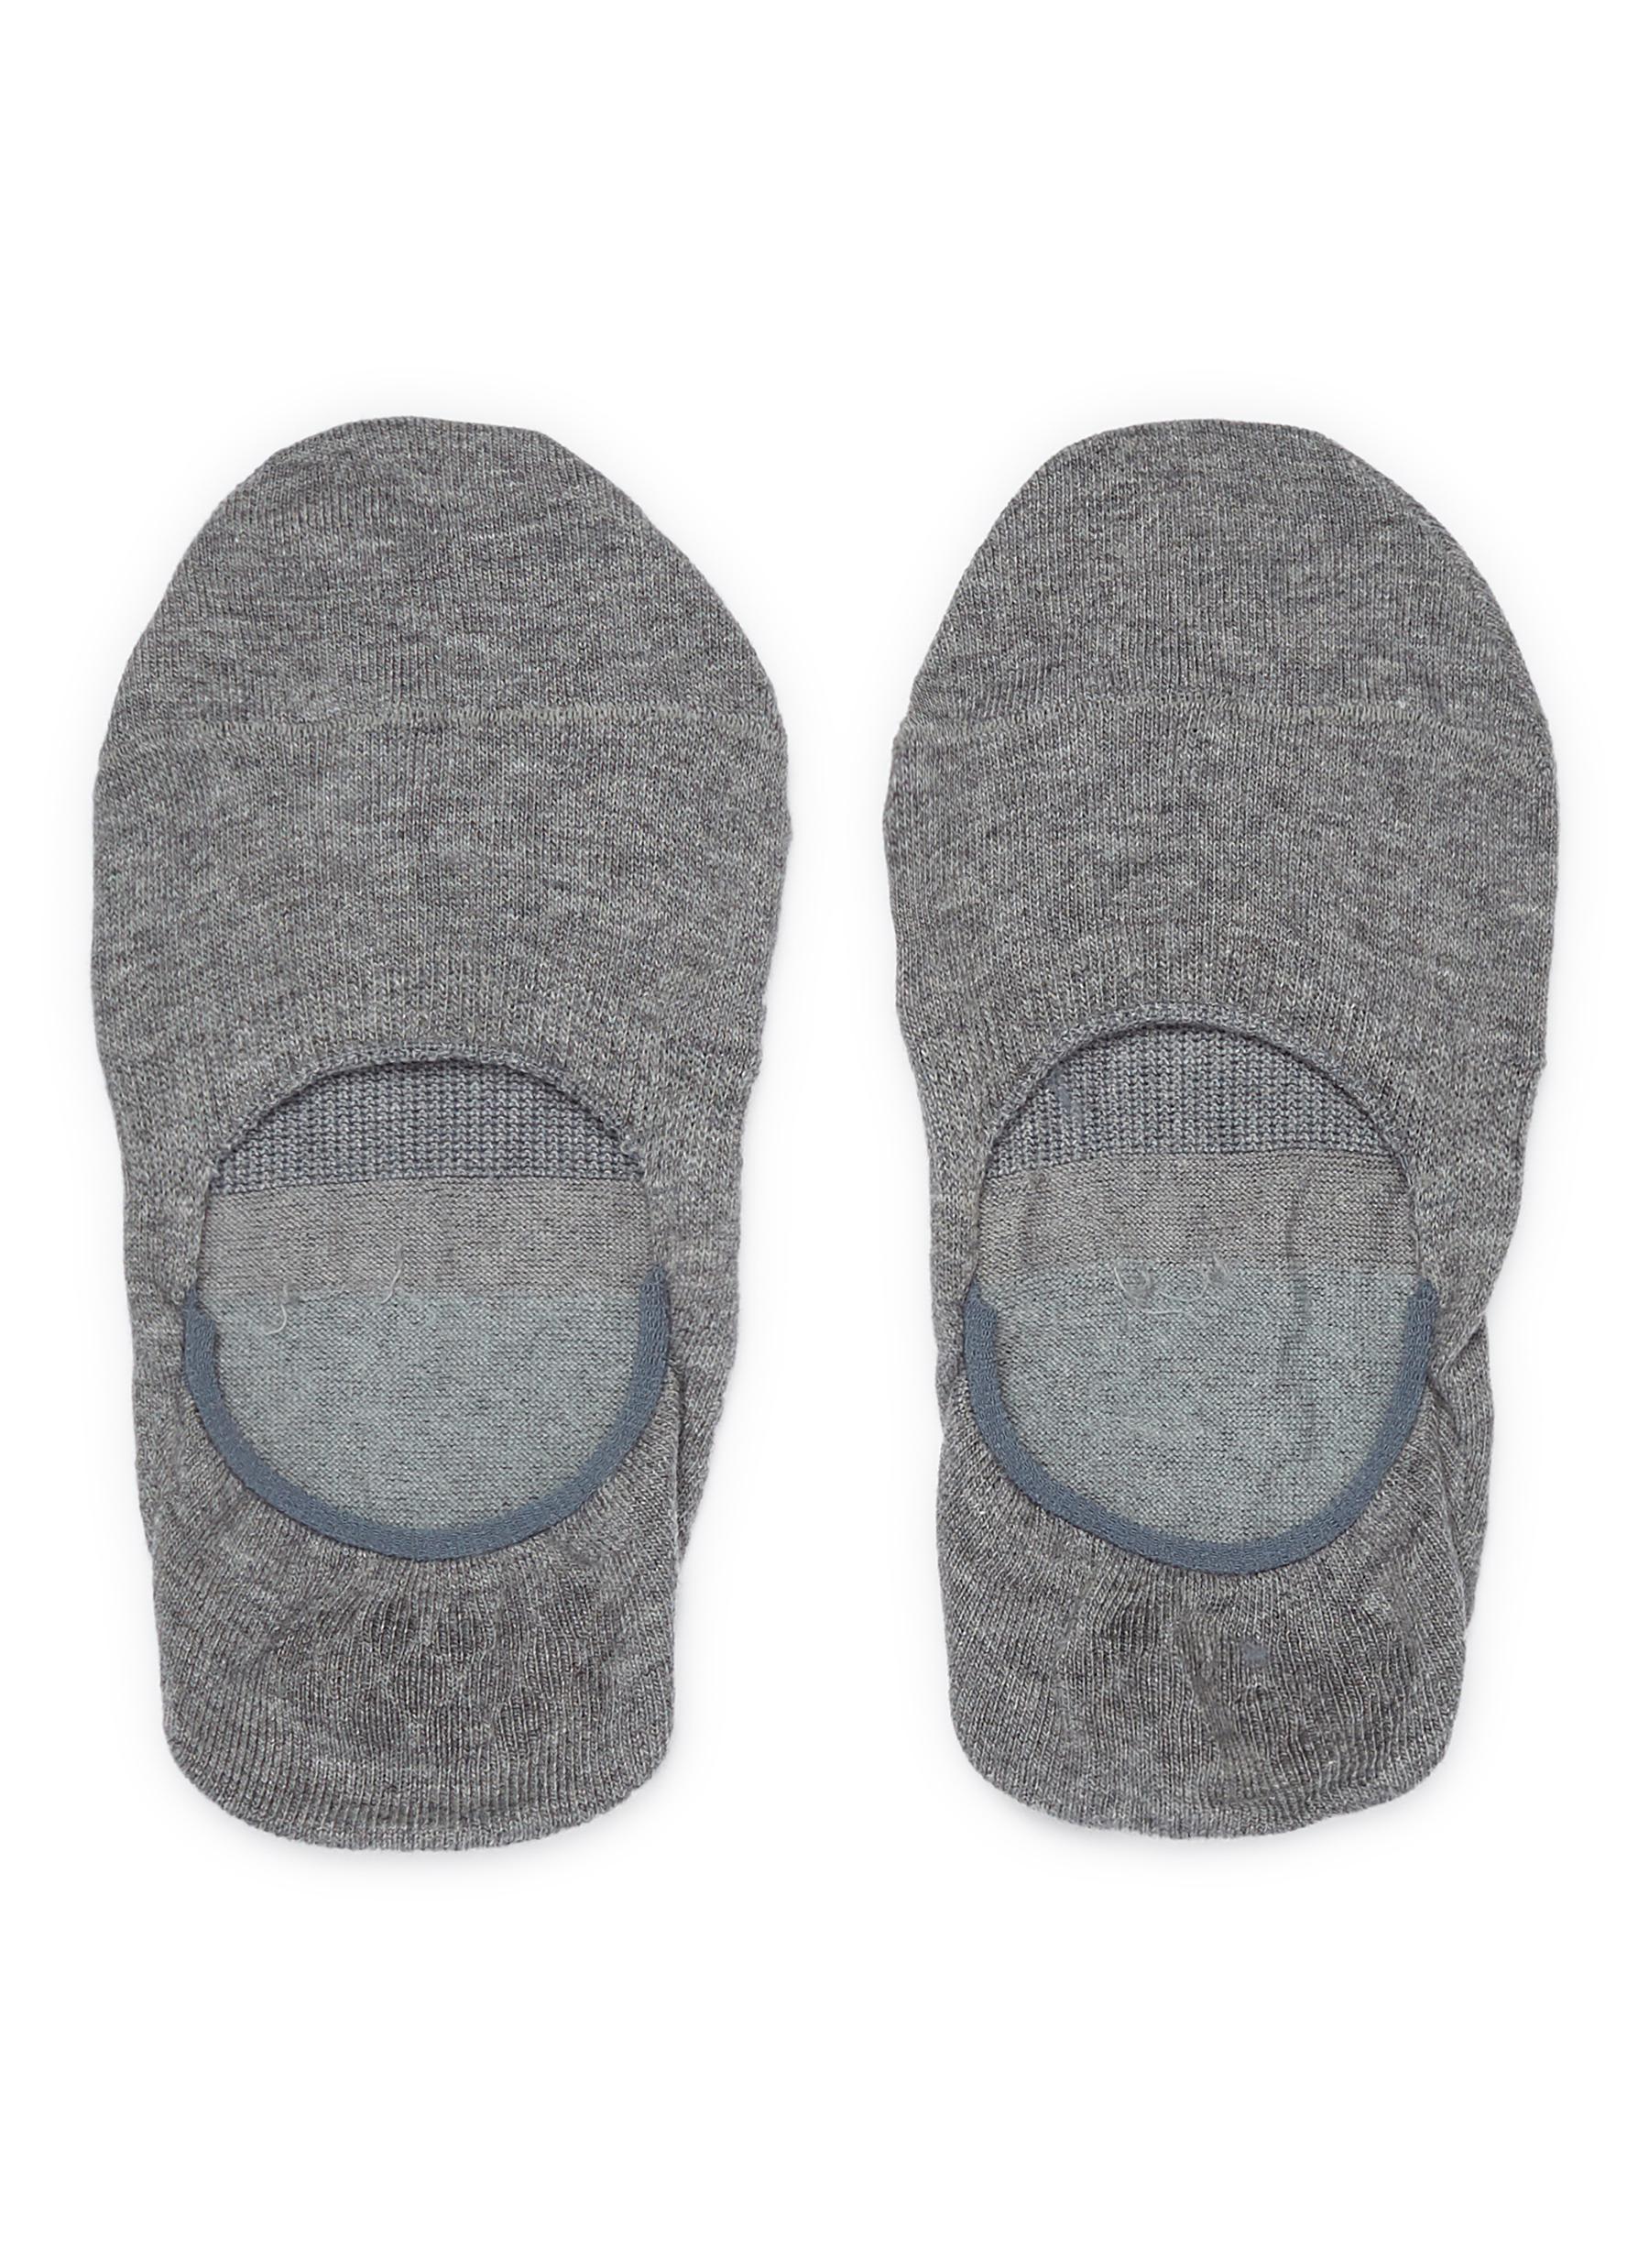 Step' ankle socks - FALKE - Modalova